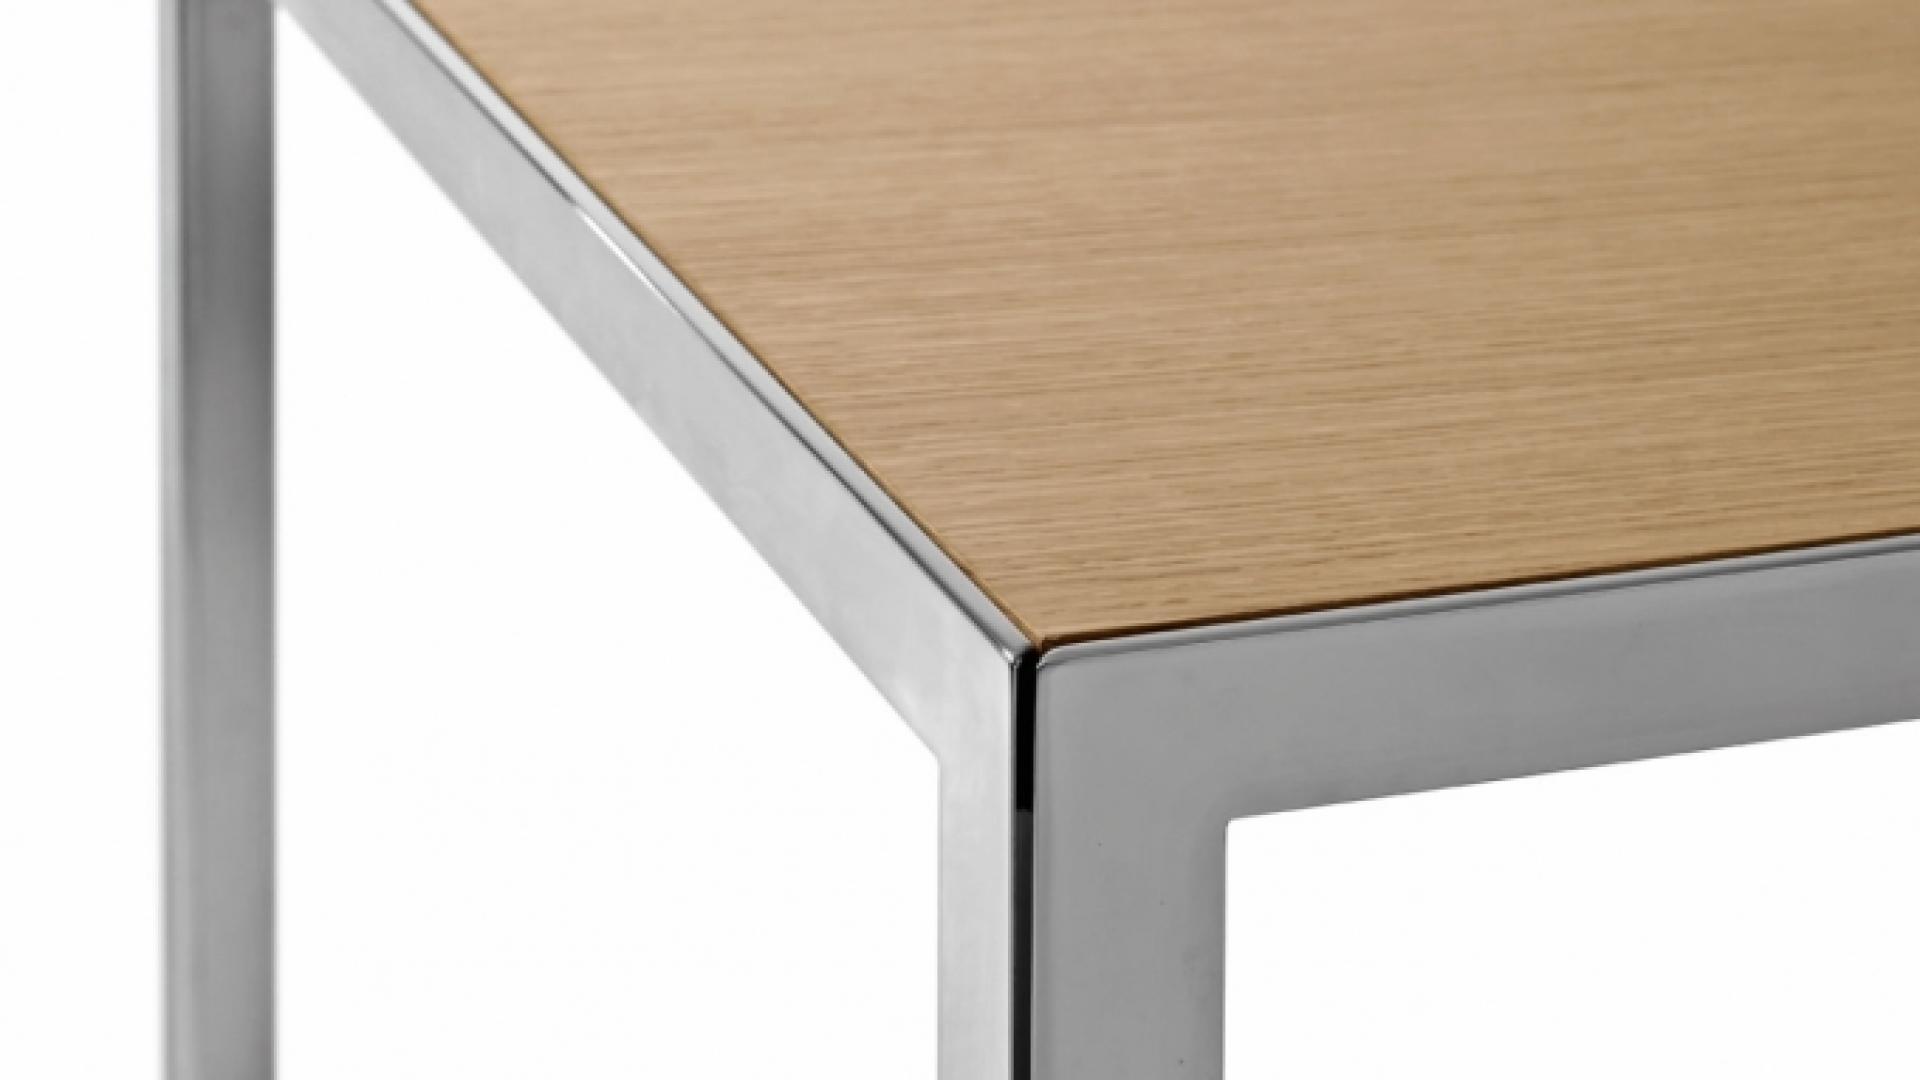 big-19-BEB_ITALIA-THE_TABLE-03.jpg